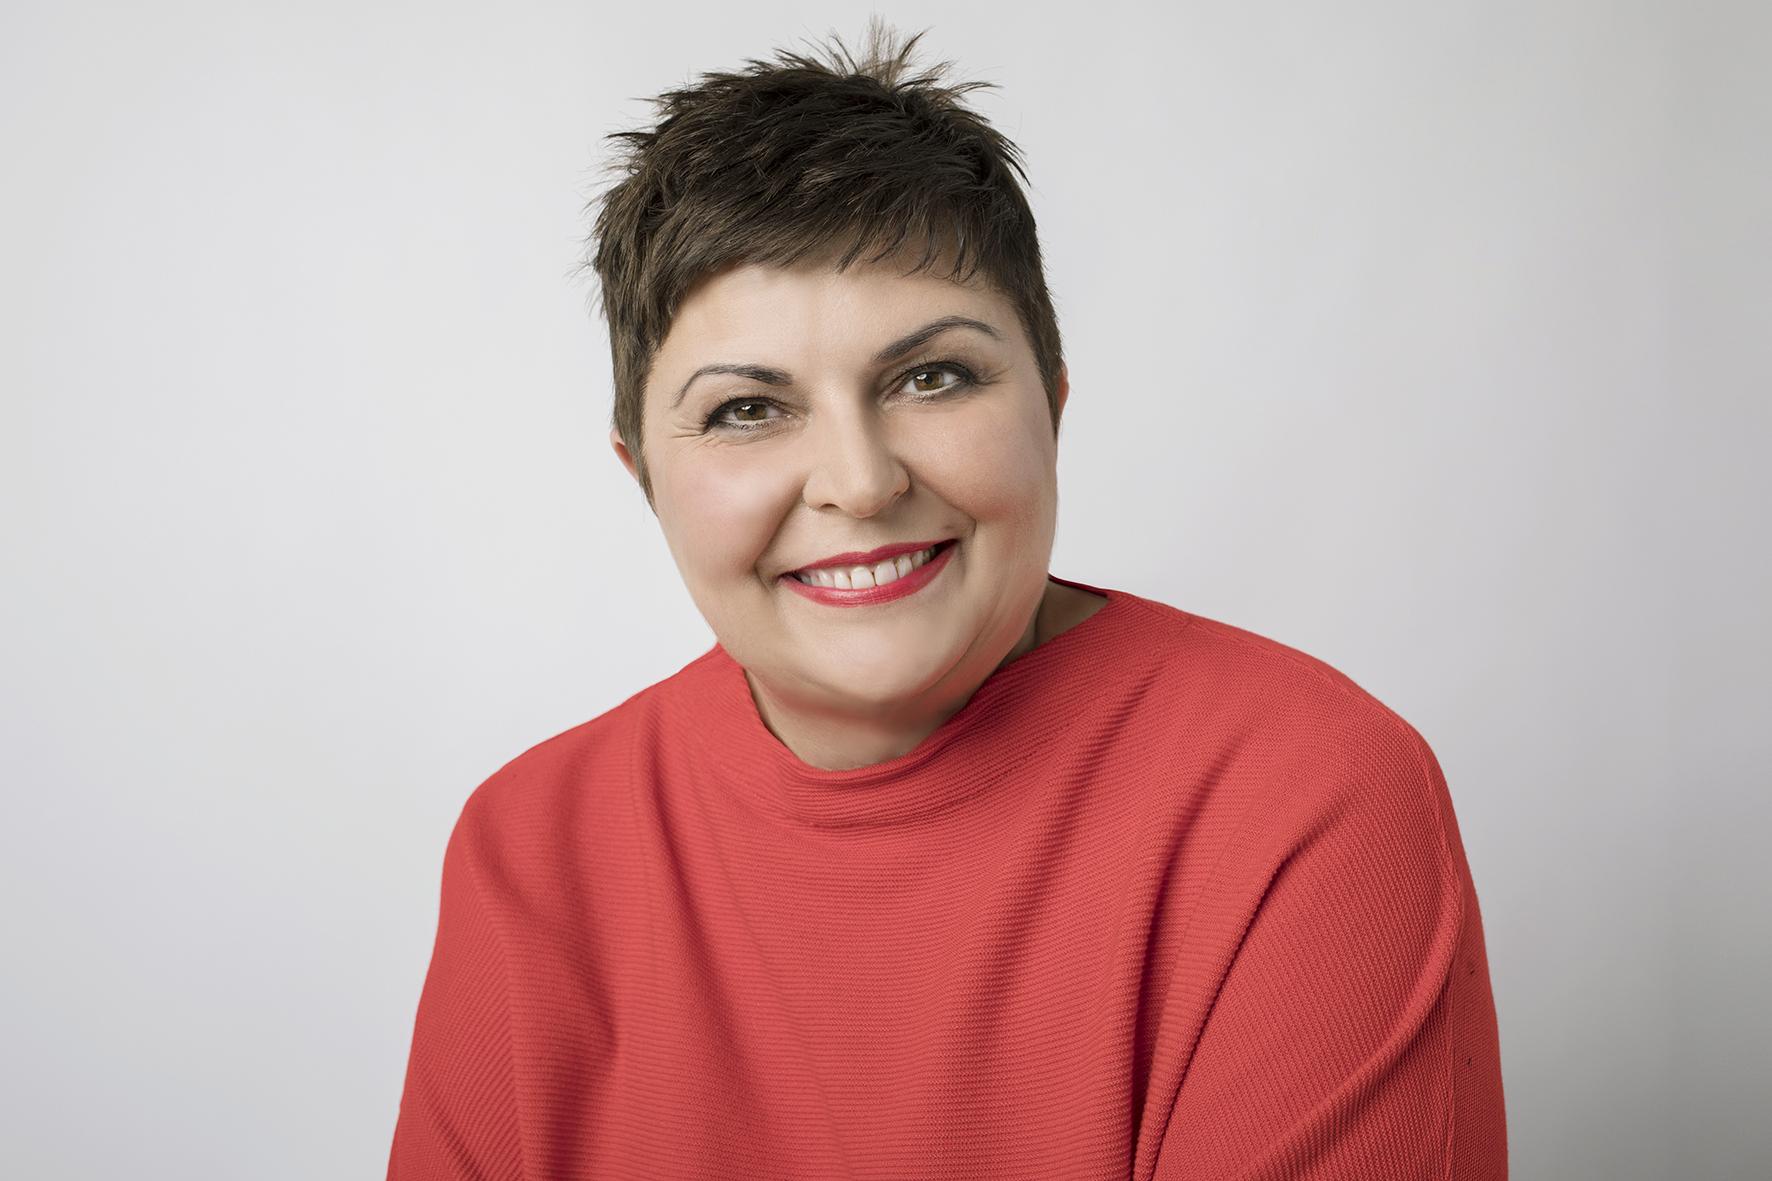 Sabina Schönhuber